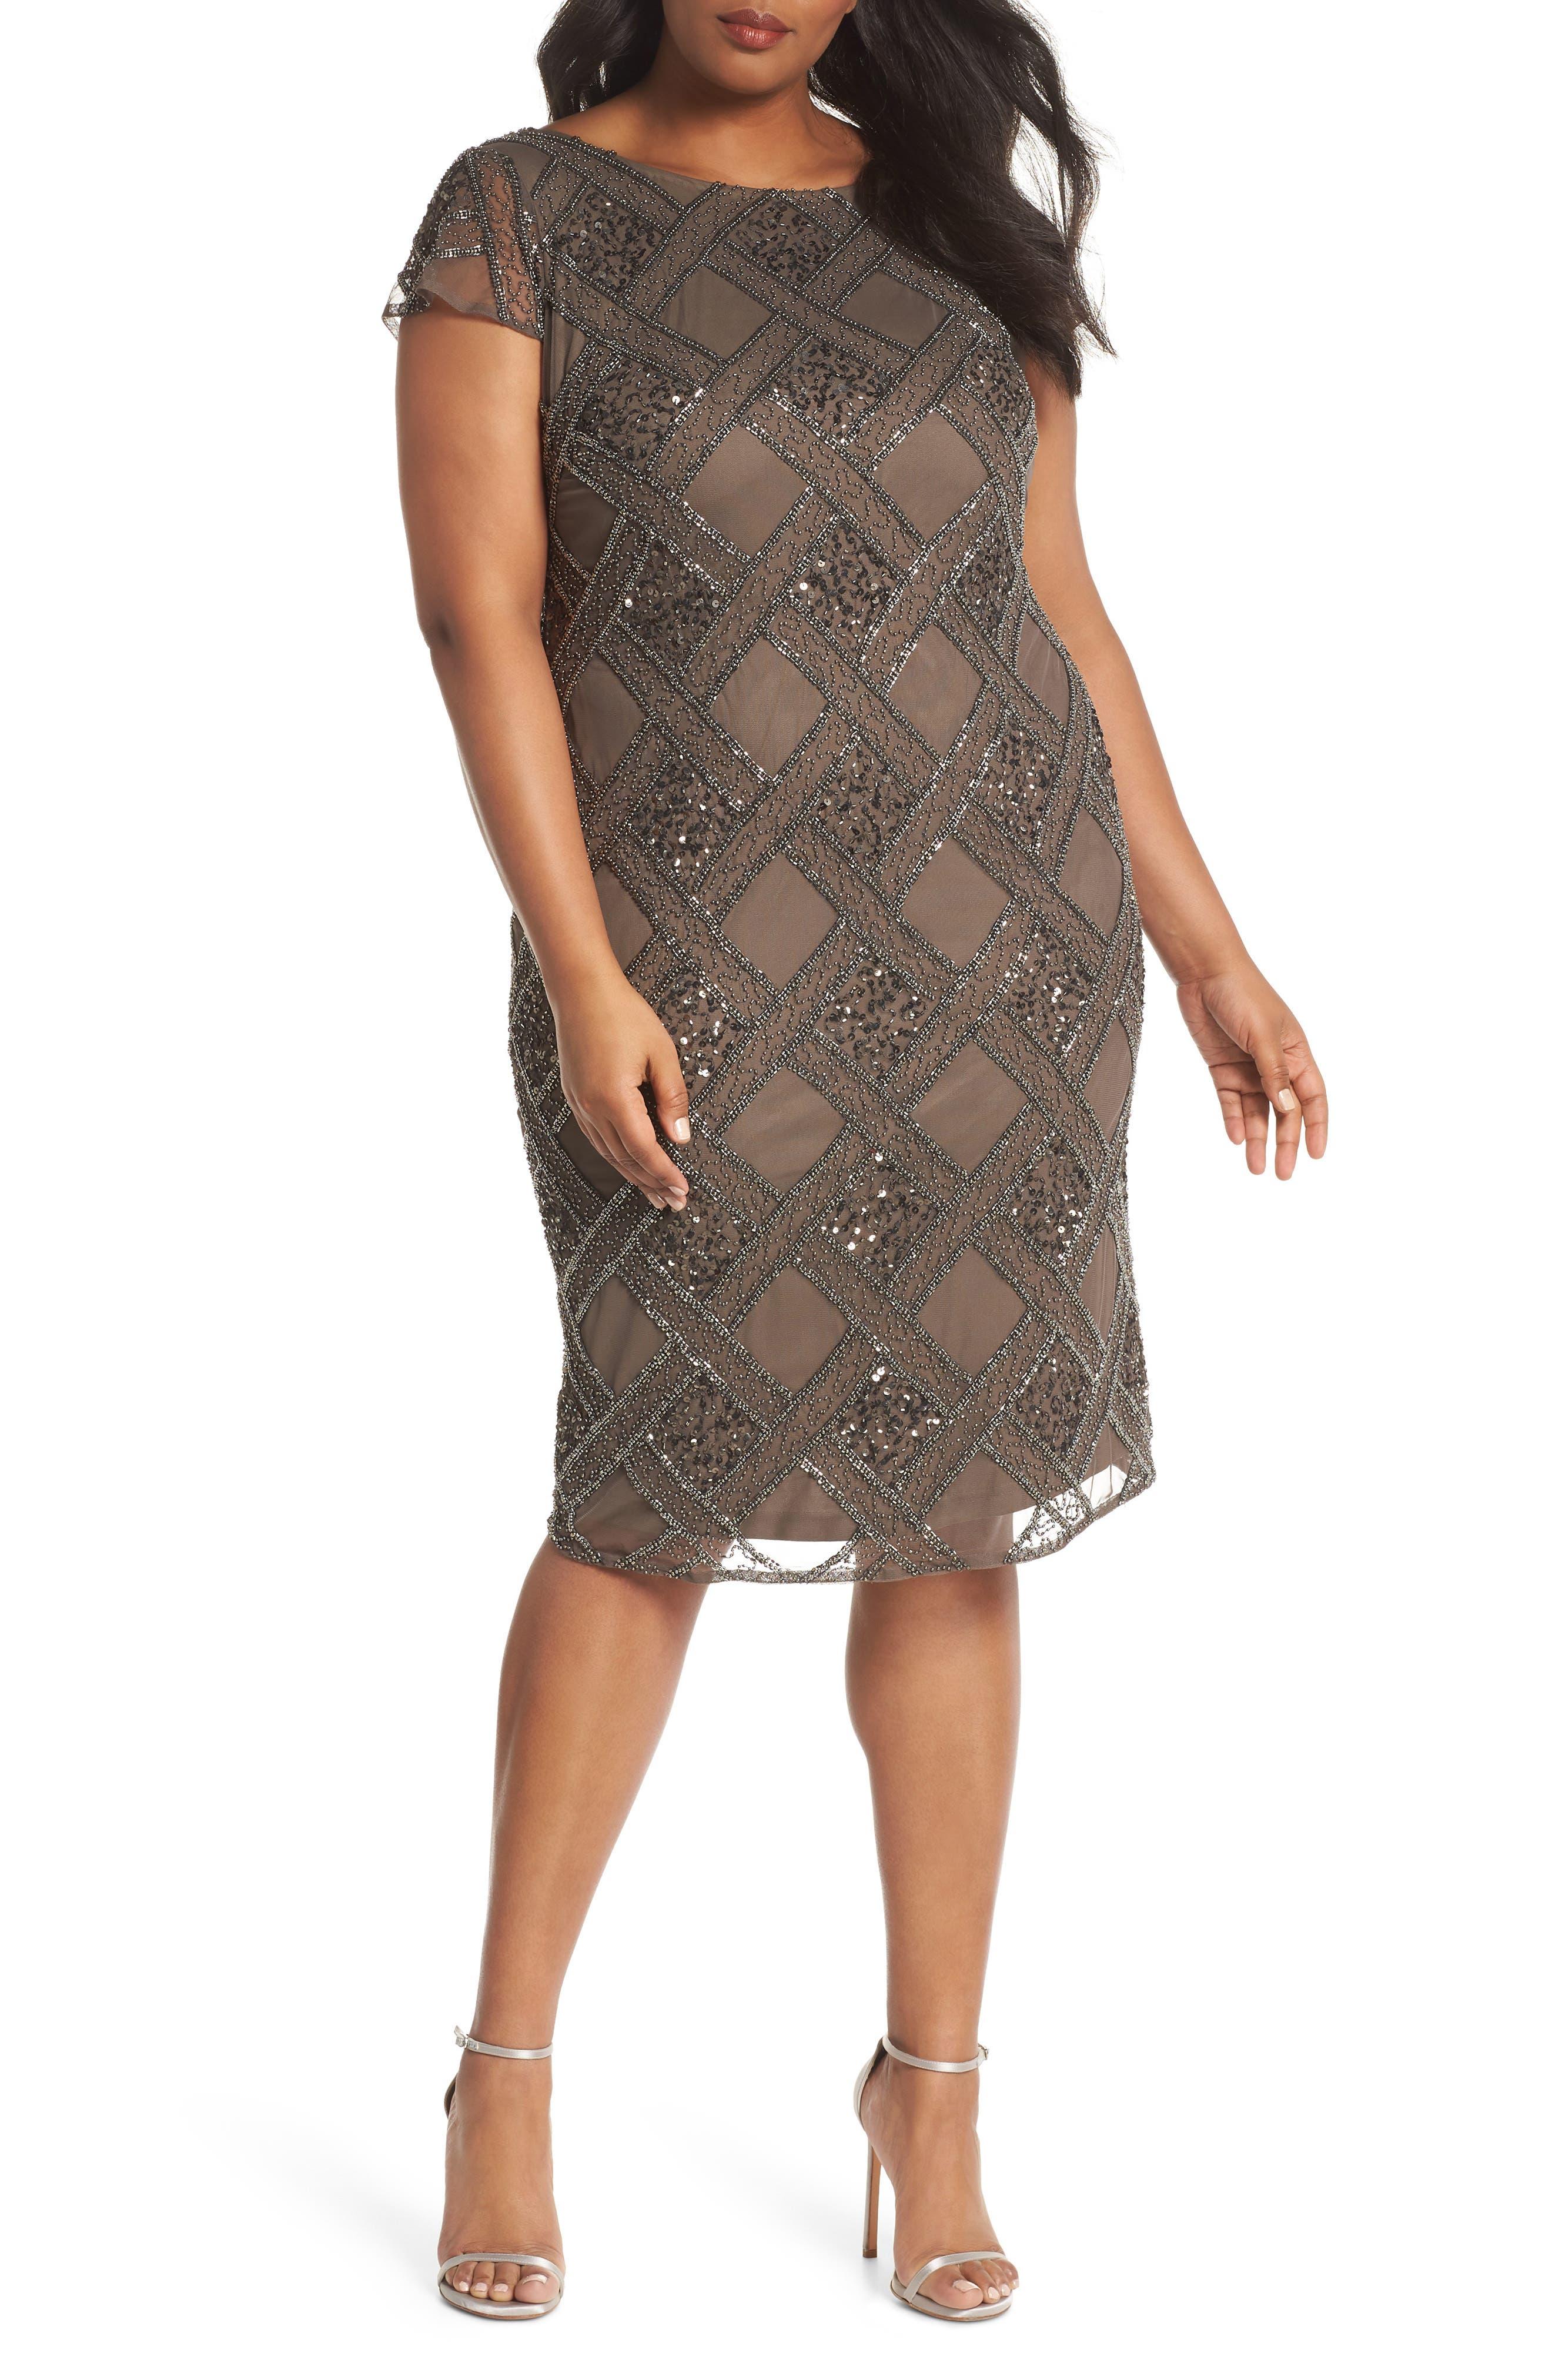 Adrianna Papell Beaded Cap Sleeve Sheath Dress (Plus Size)